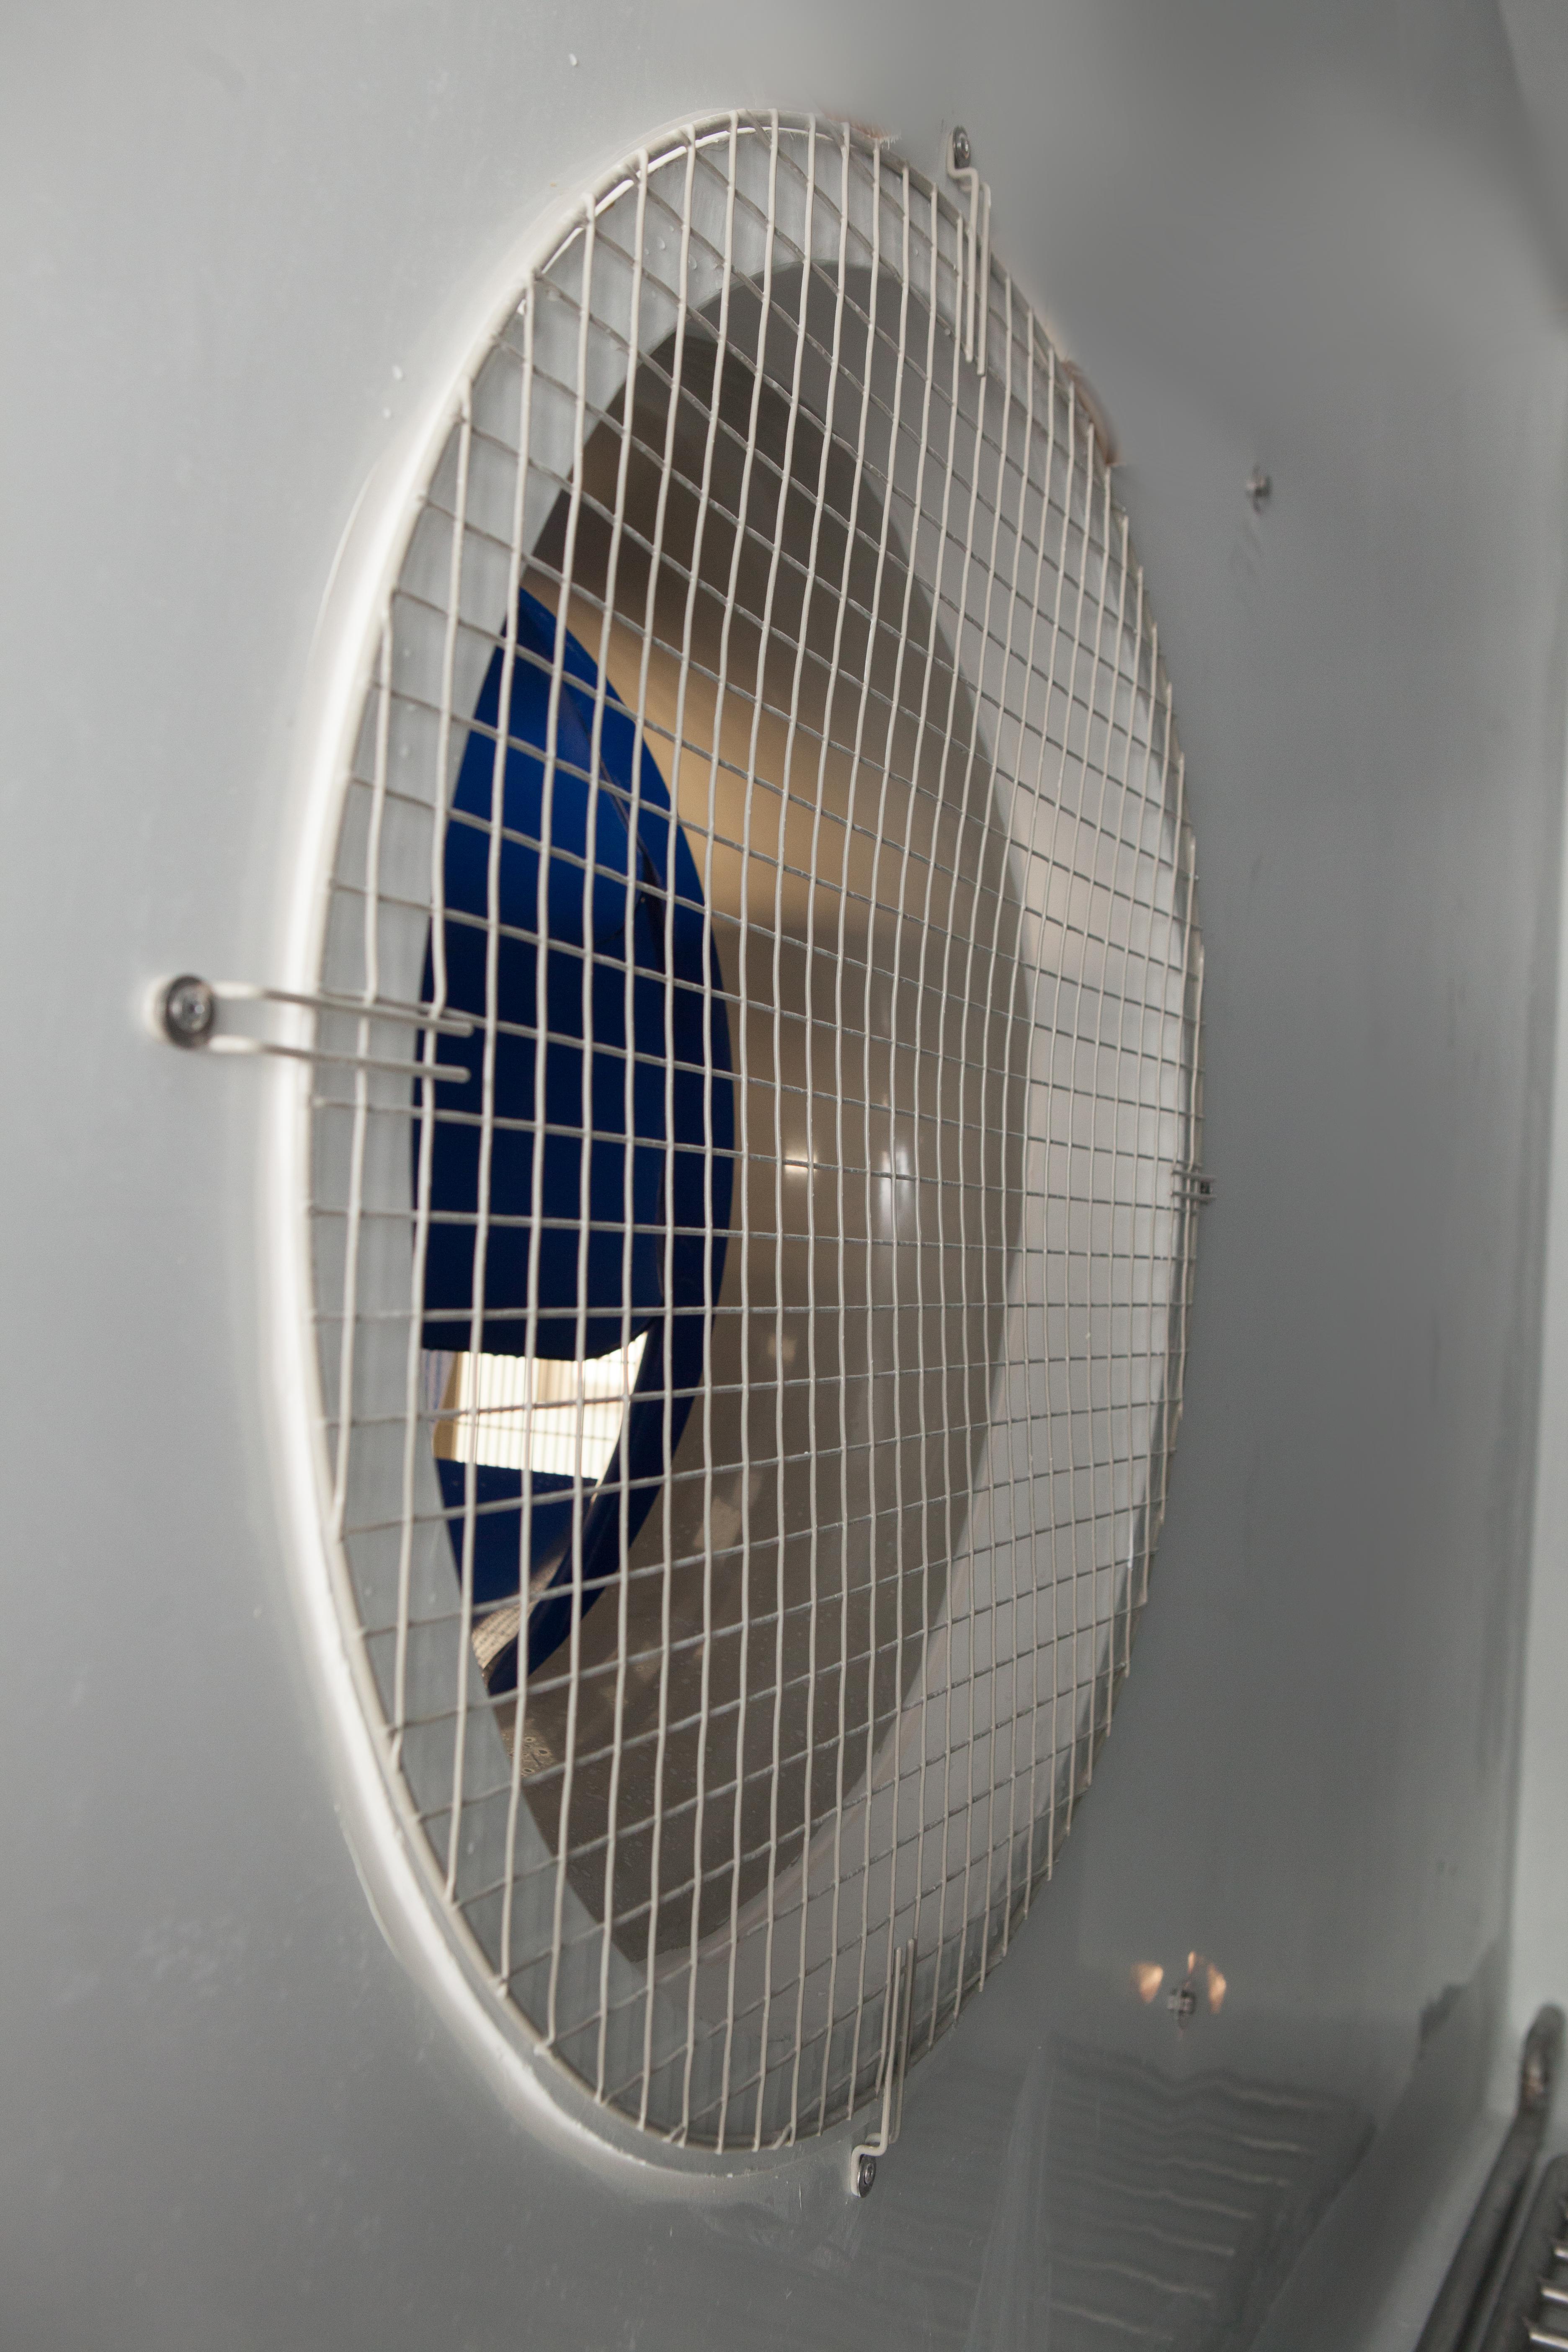 Air handling unit AHU - fan